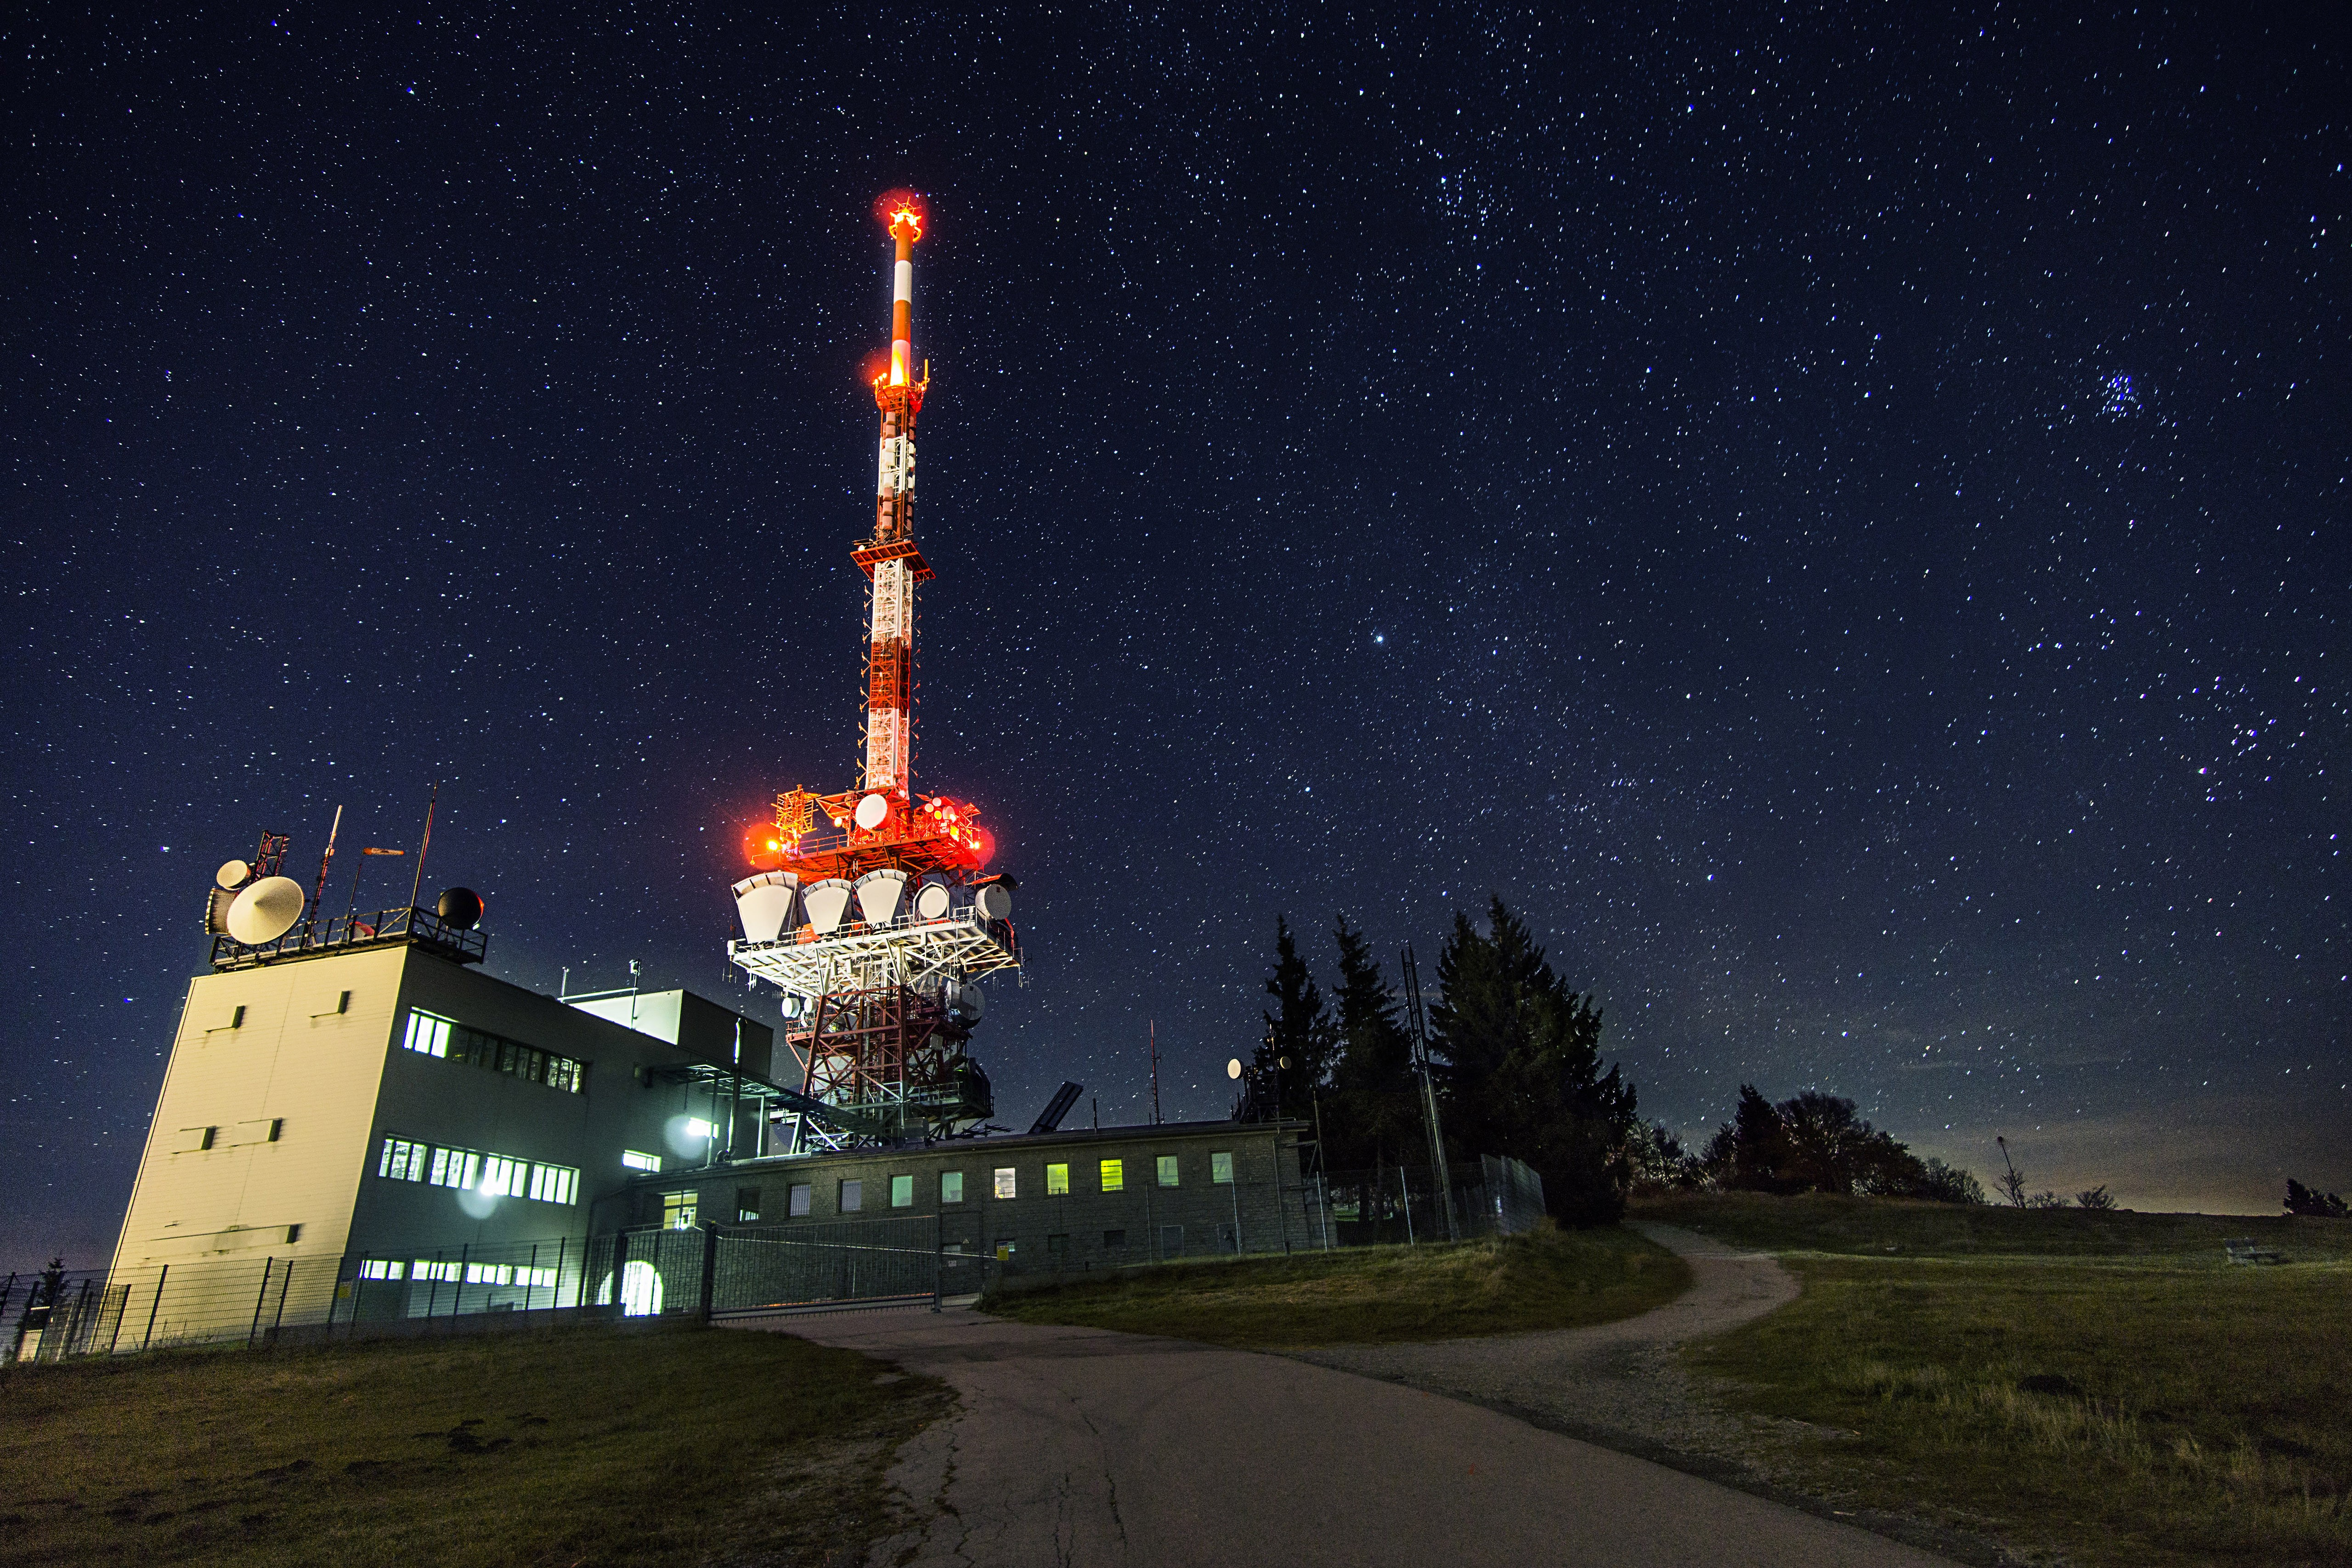 General 5120x3413 antenna radio satellite network radio tower night facility